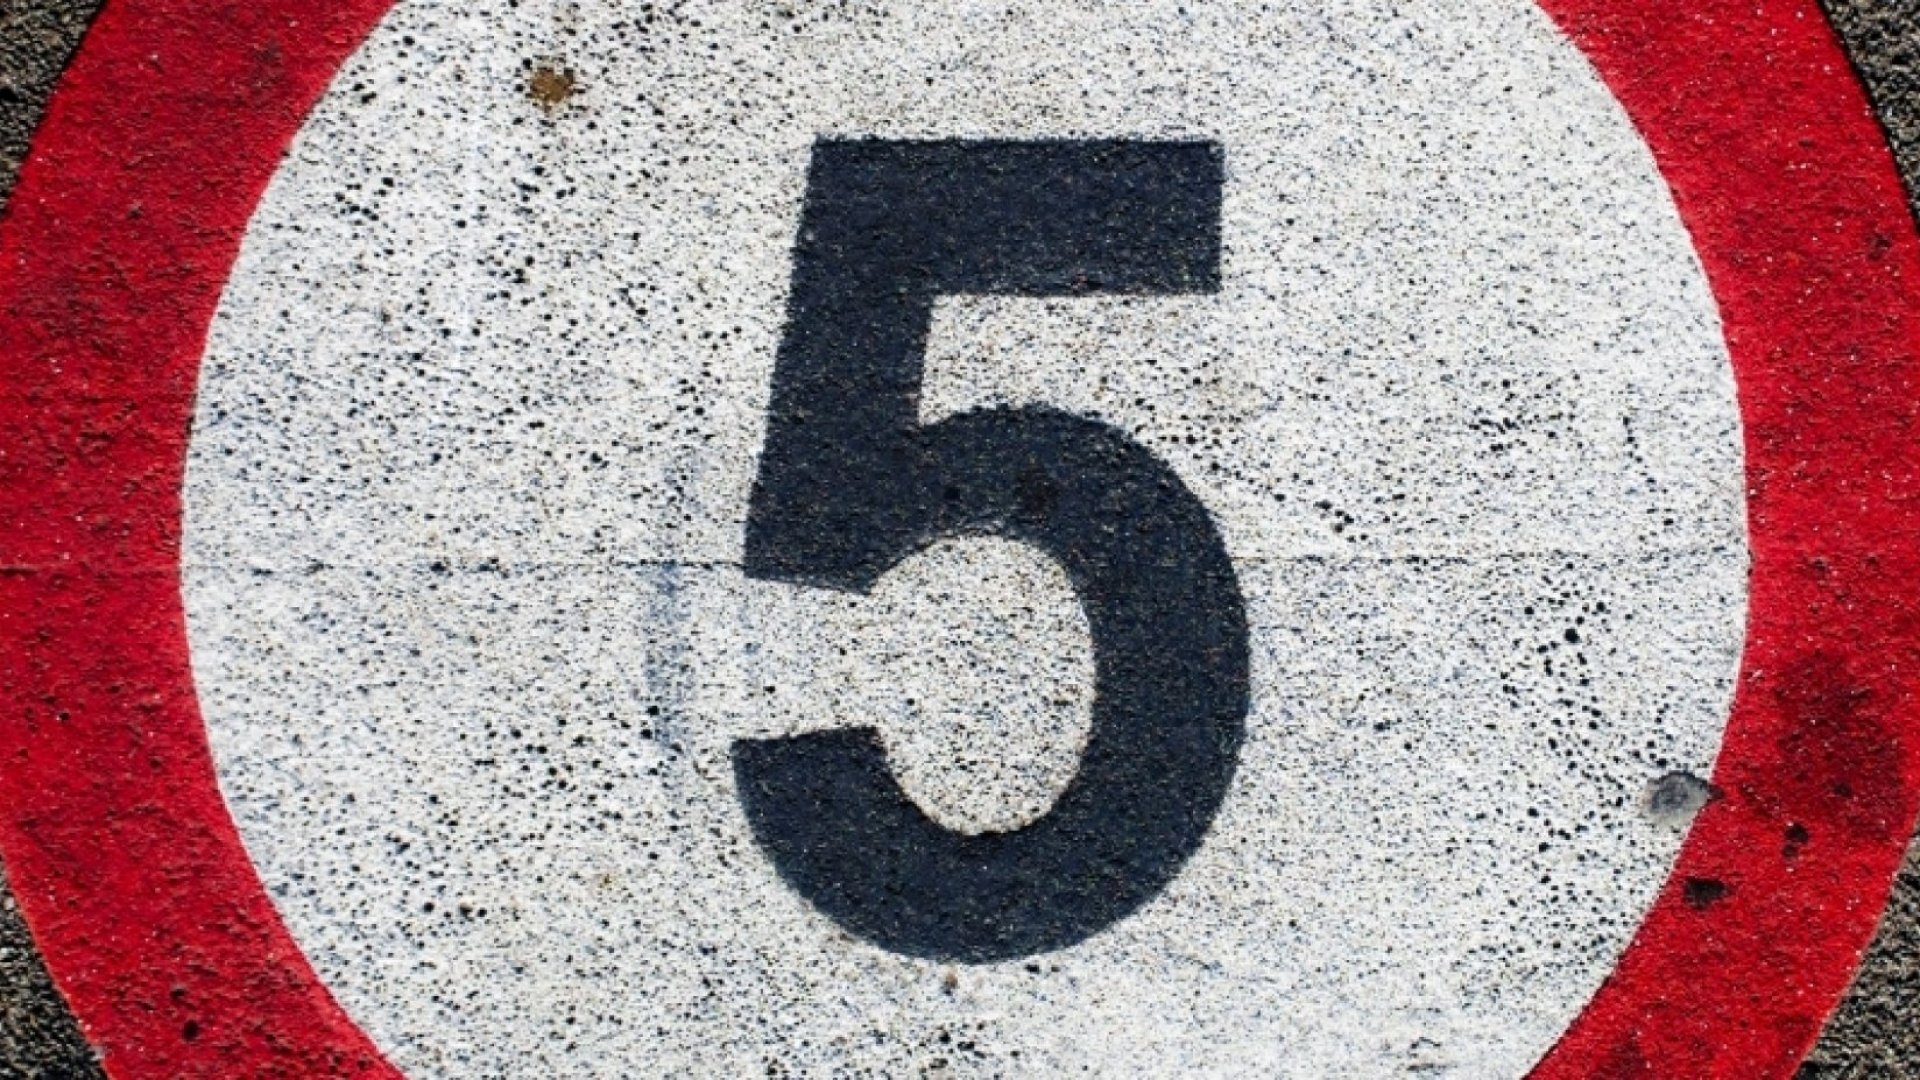 5 Simple Ways to Explain Change